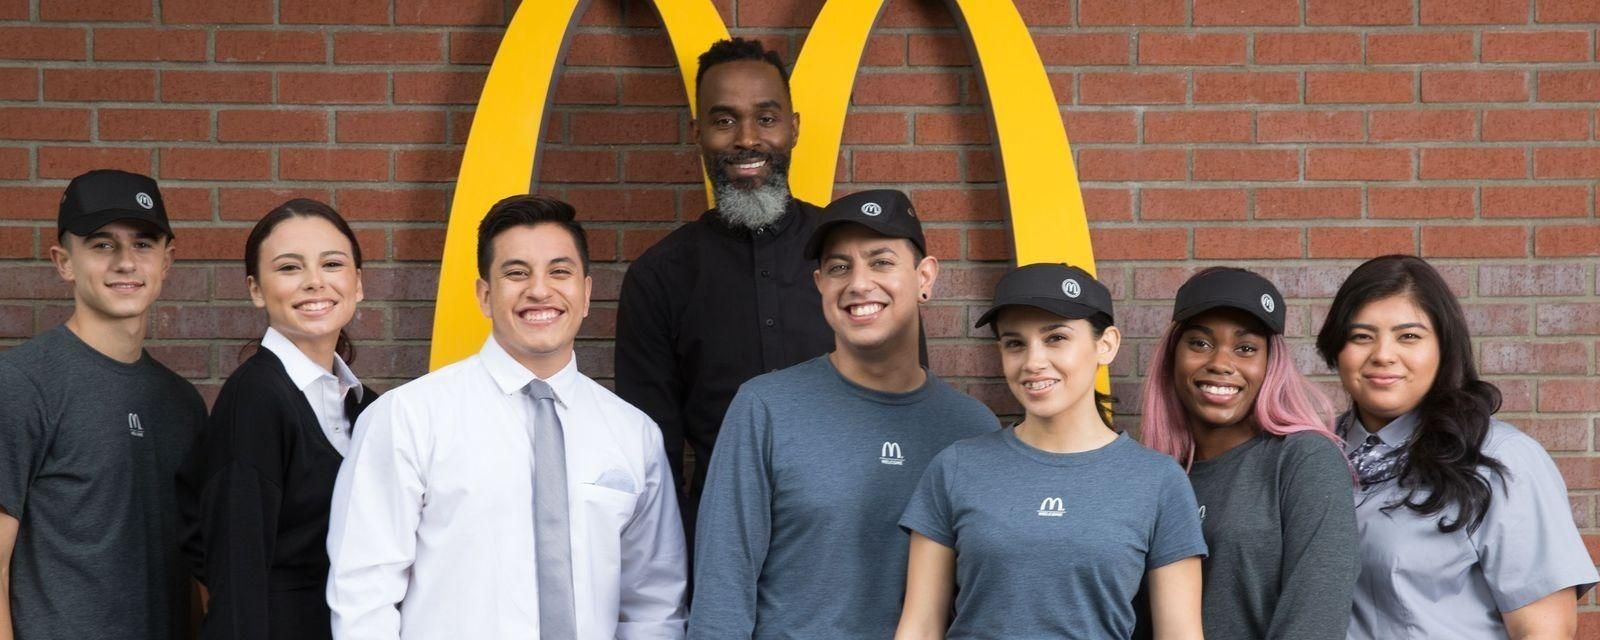 McDonald's Brand Cover